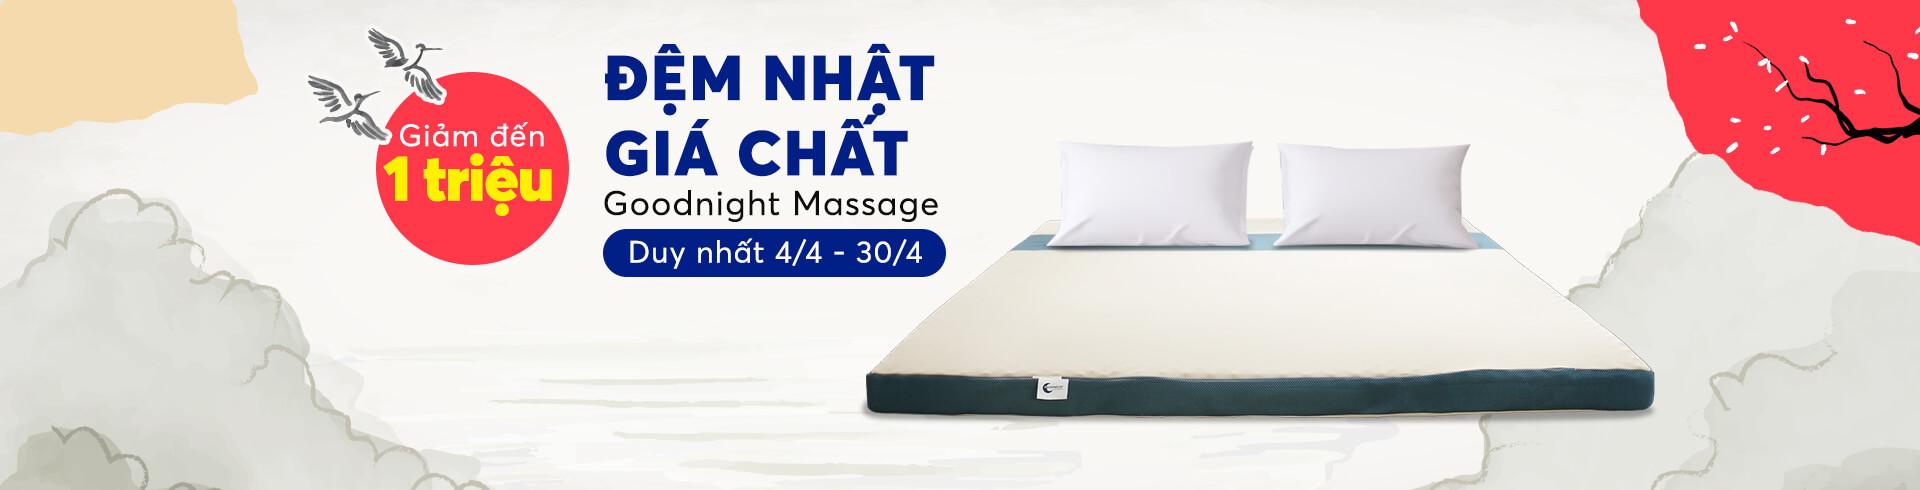 Đệm Foam Goodnight Massage Nhật Bản